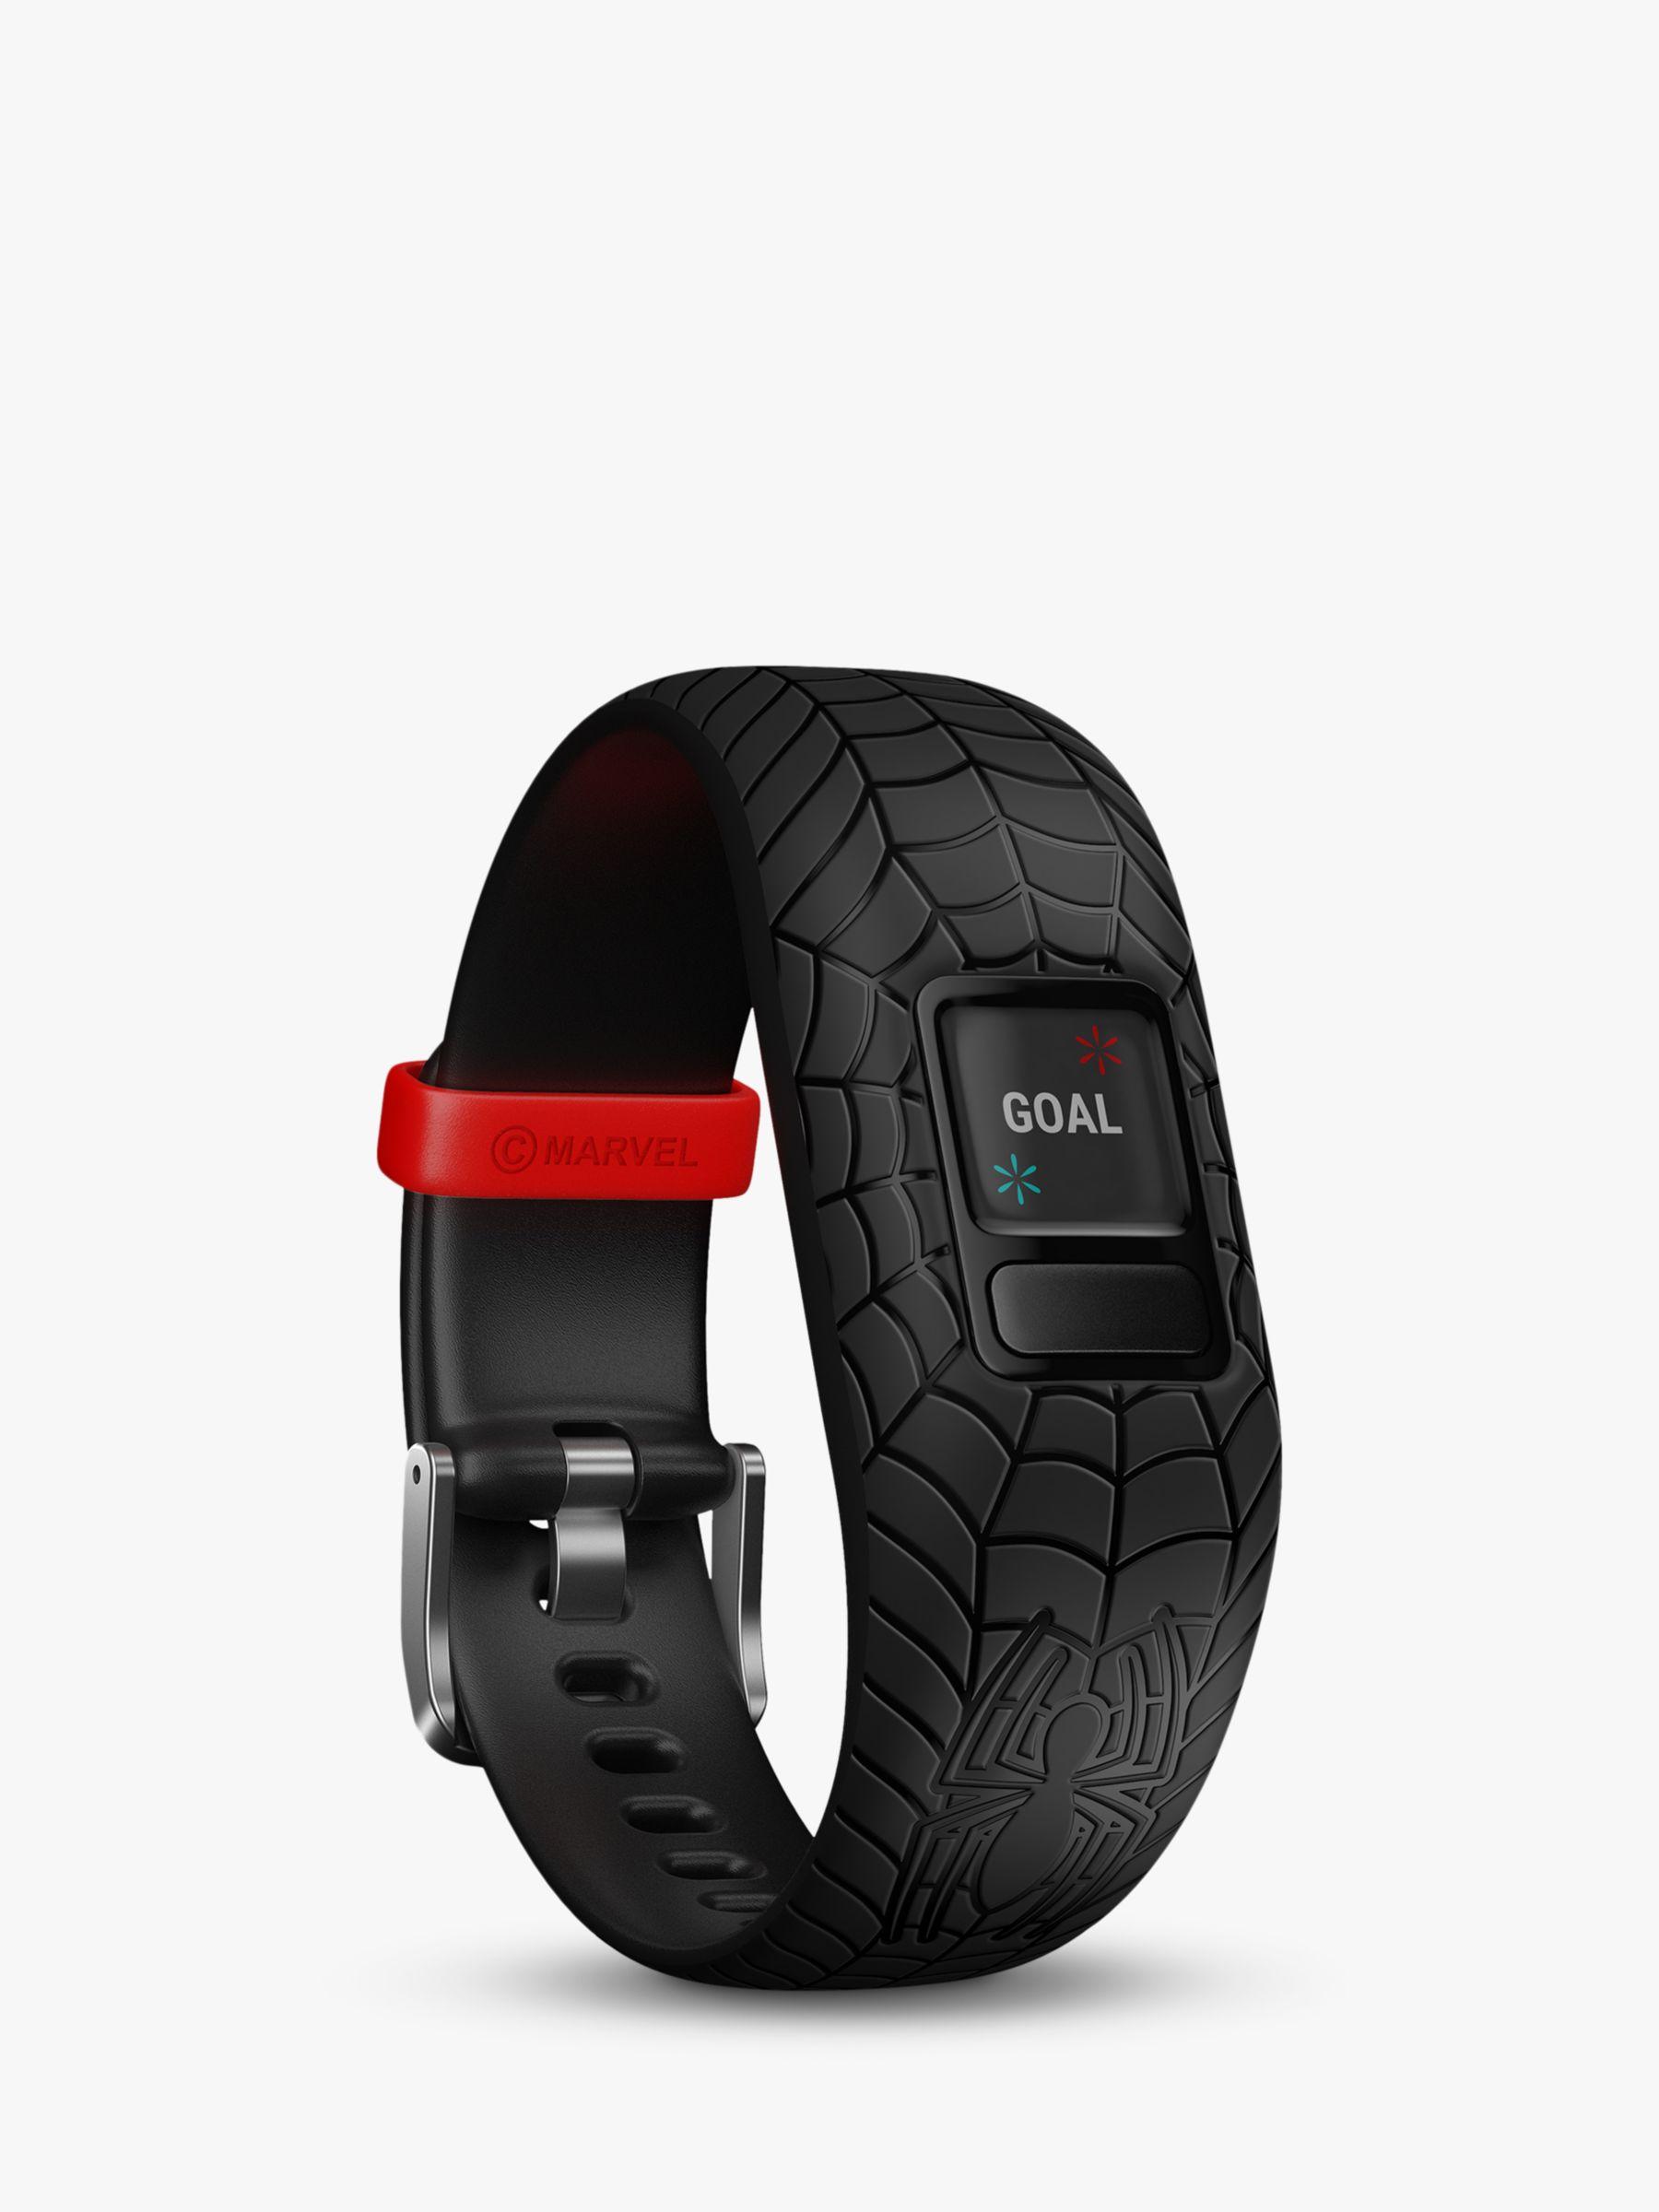 Garmin Garmin vivofit jr. 2, Adjustable Marvel Spider-Man Activity Tracker and Watch for Children, Black